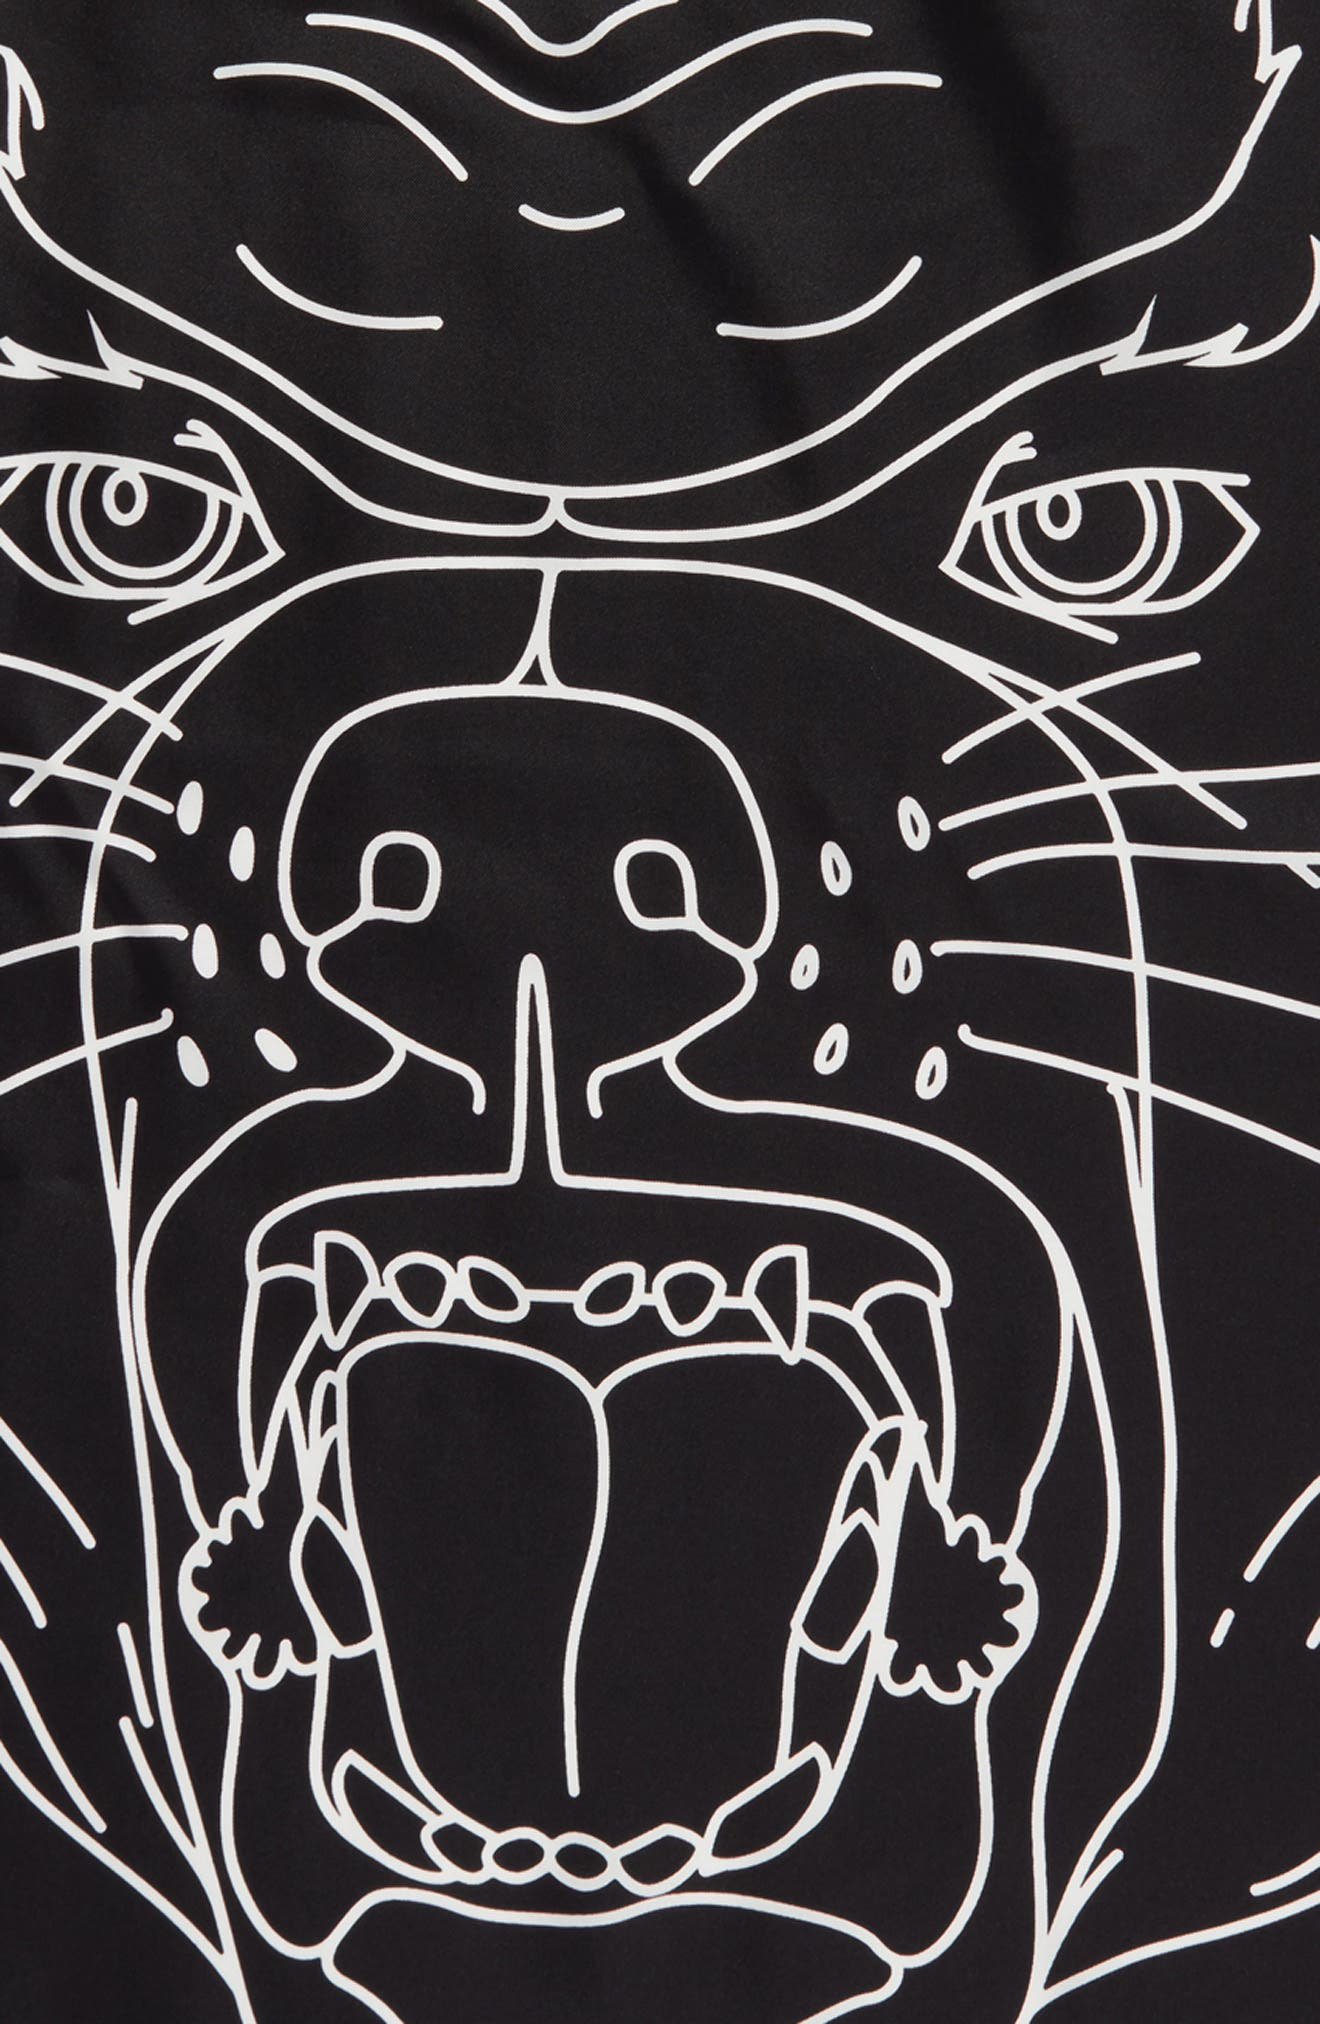 Rottweiler Silk Twill Scarf,                             Alternate thumbnail 4, color,                             Black/White